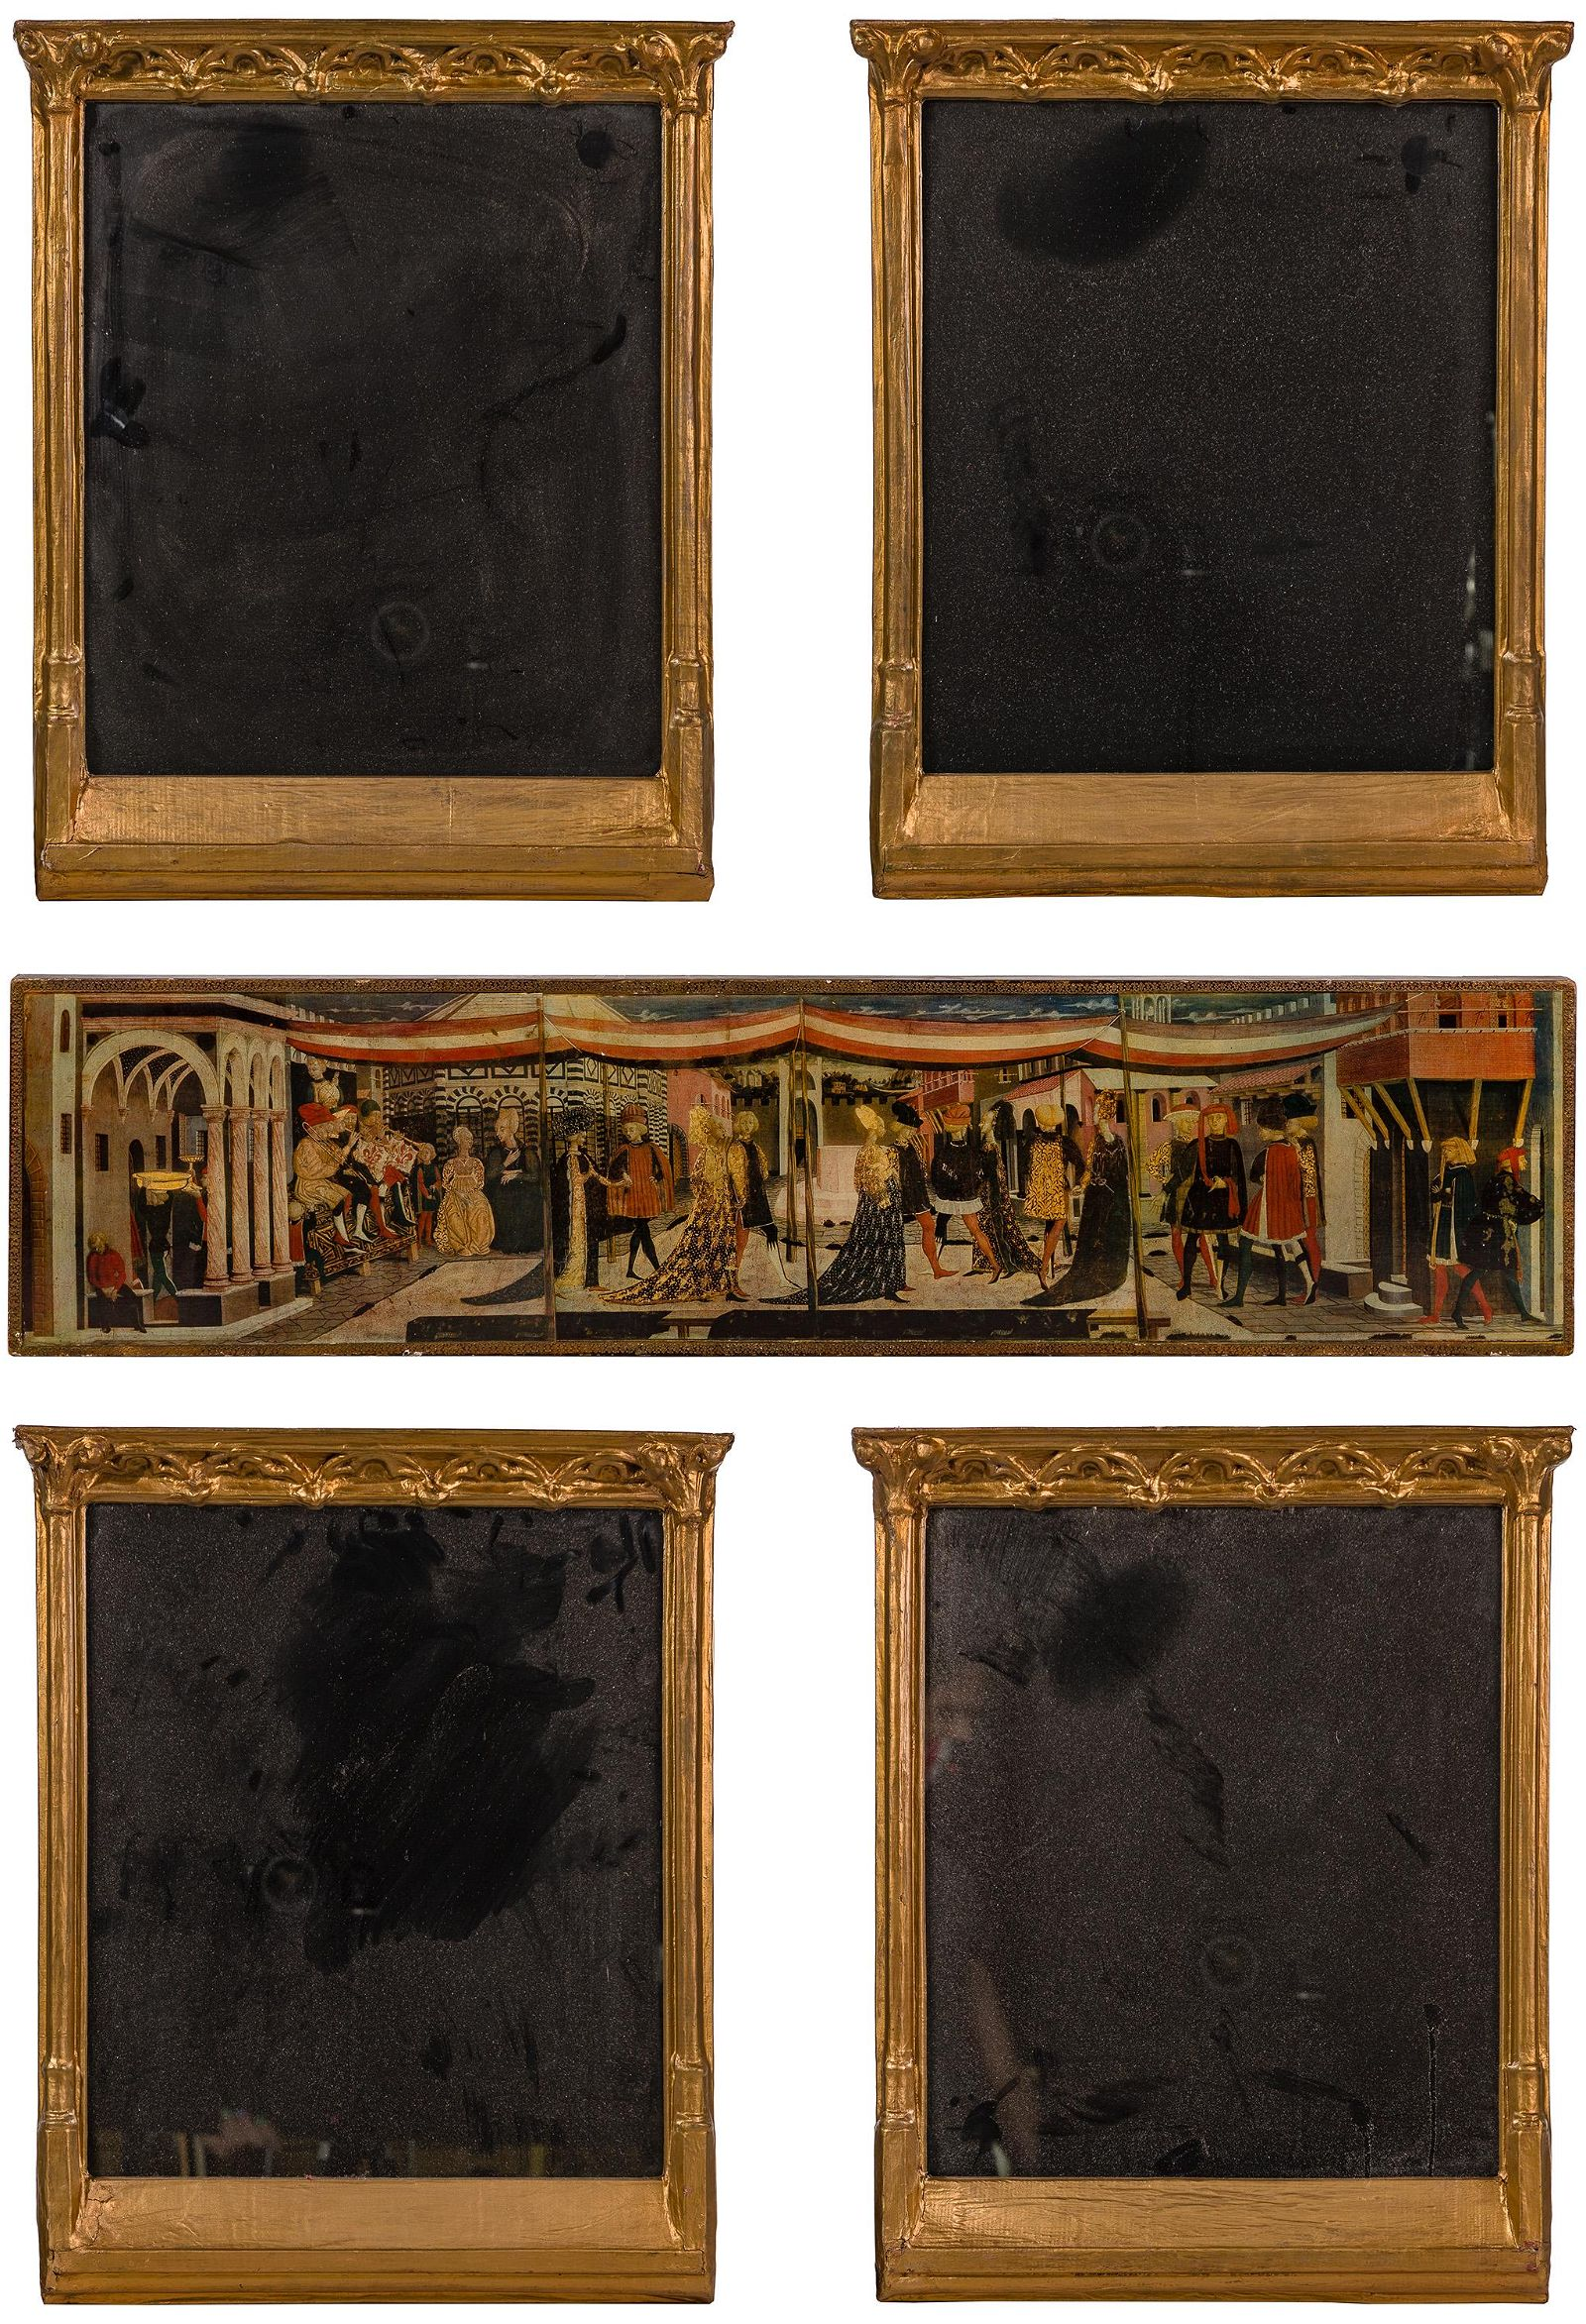 Medieval Style Decorative Art Assortment